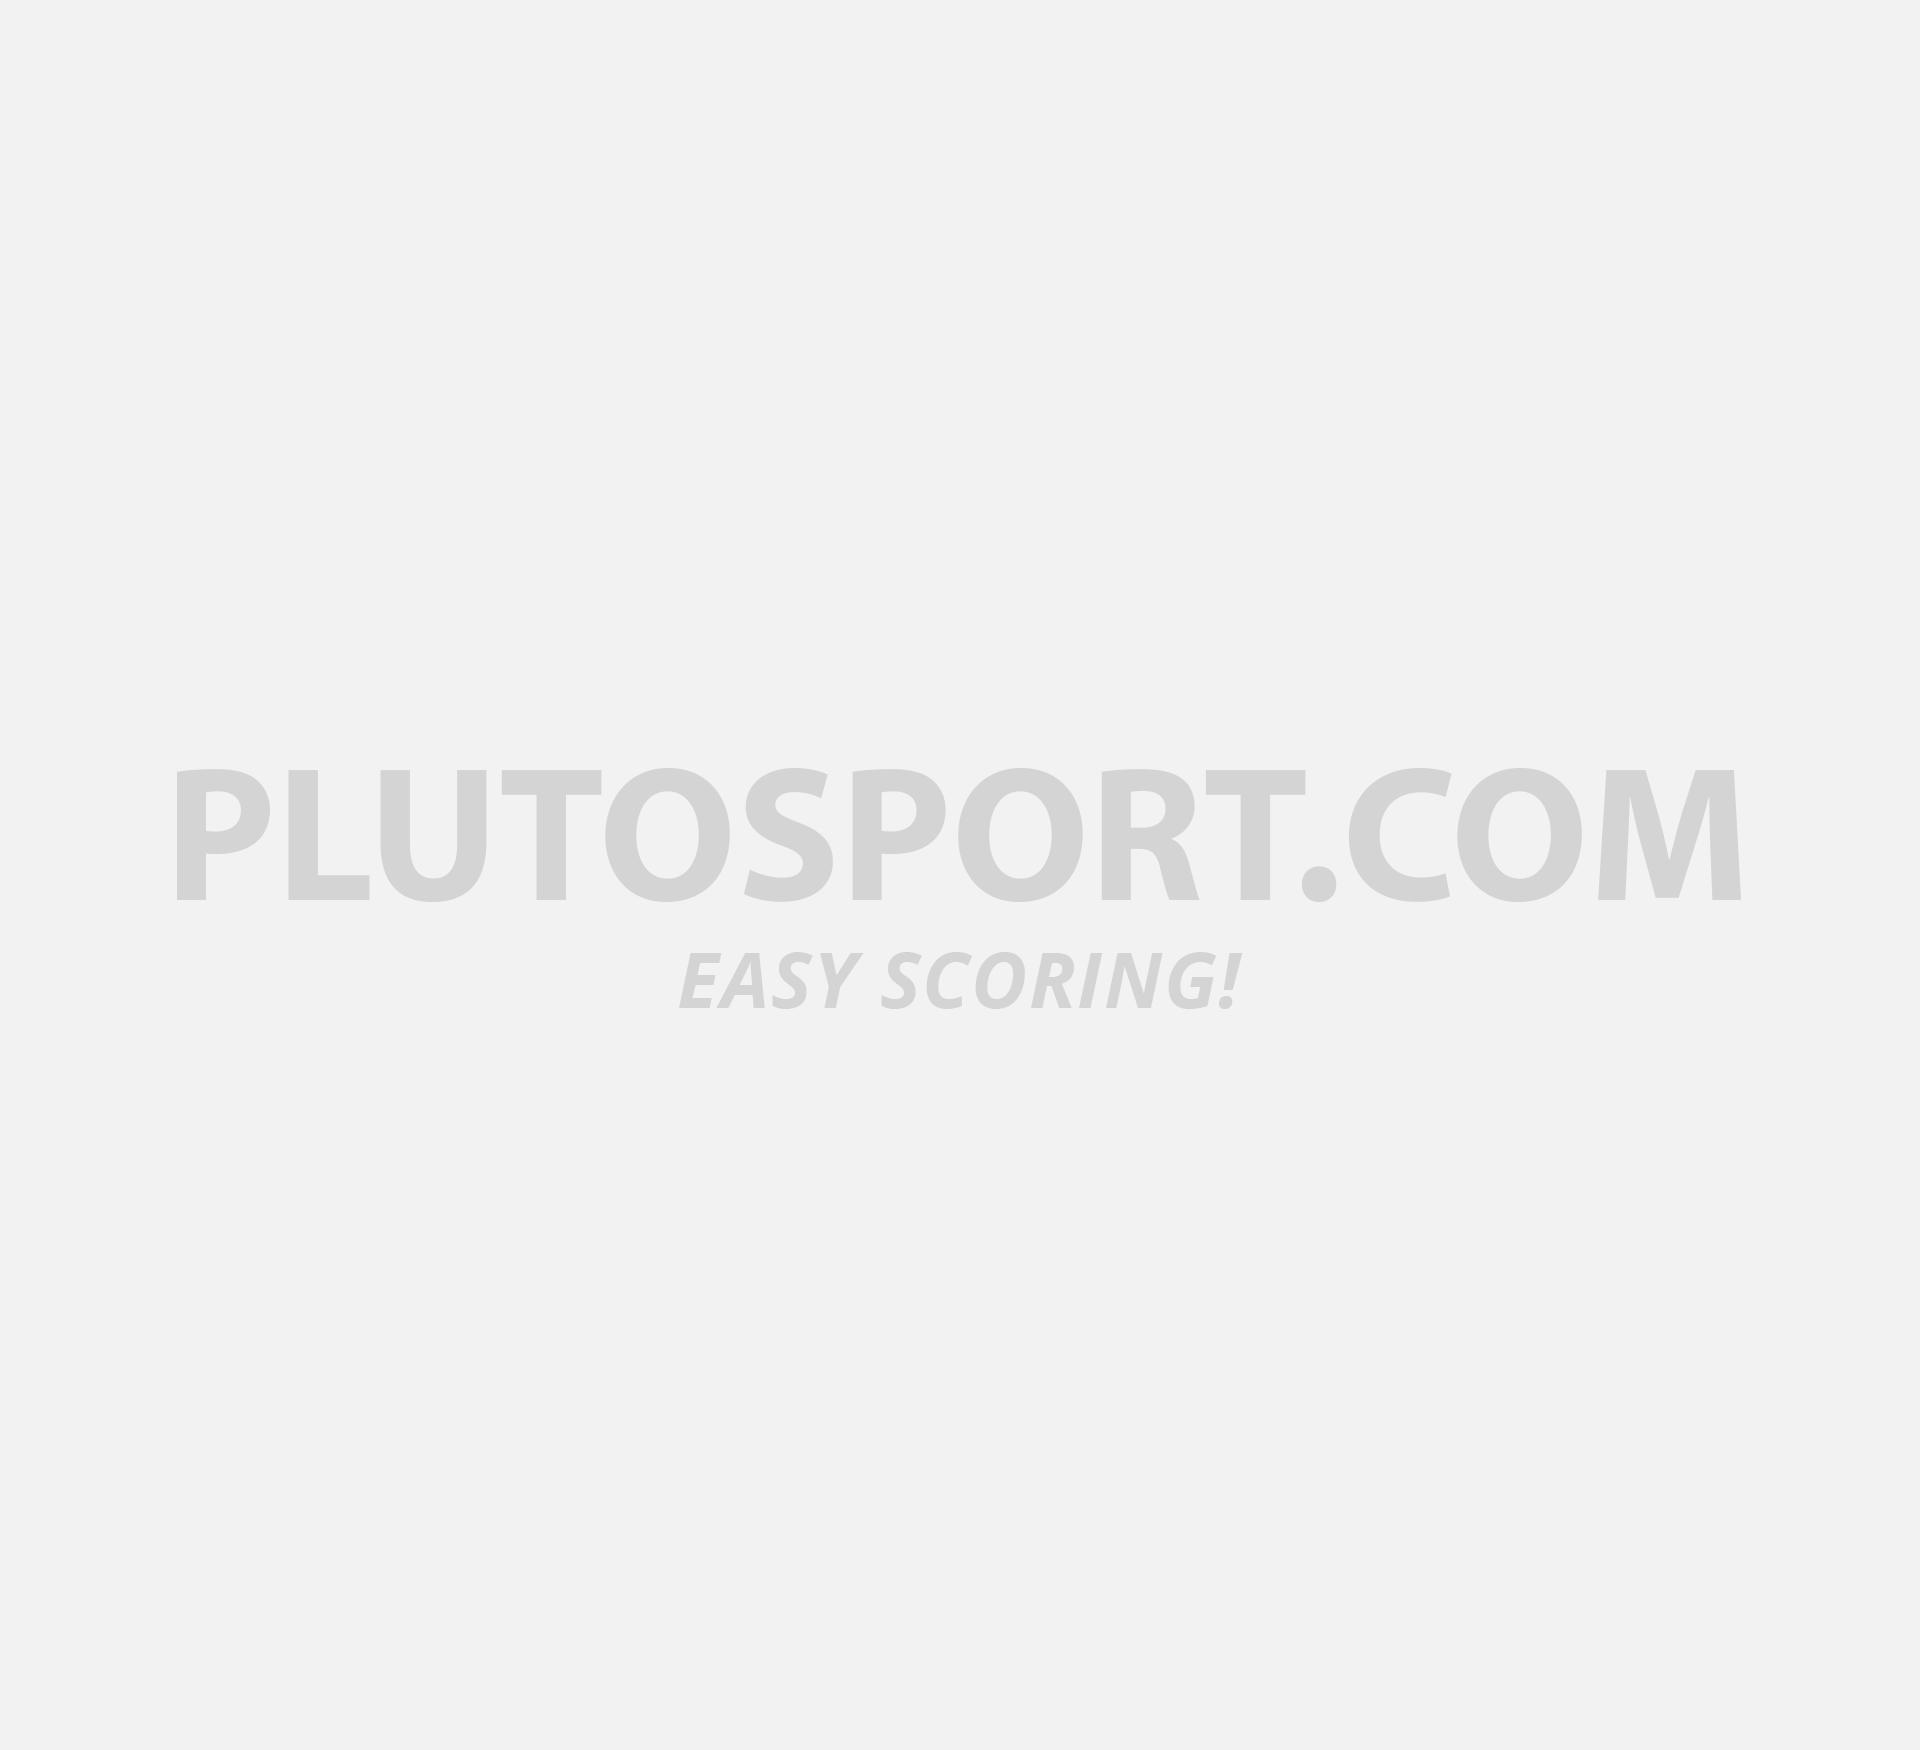 4d3dc13e552df Adidas Supernova Sequence 5 Running Shoes Men - Overpronation - Shoes -  Running - Sports